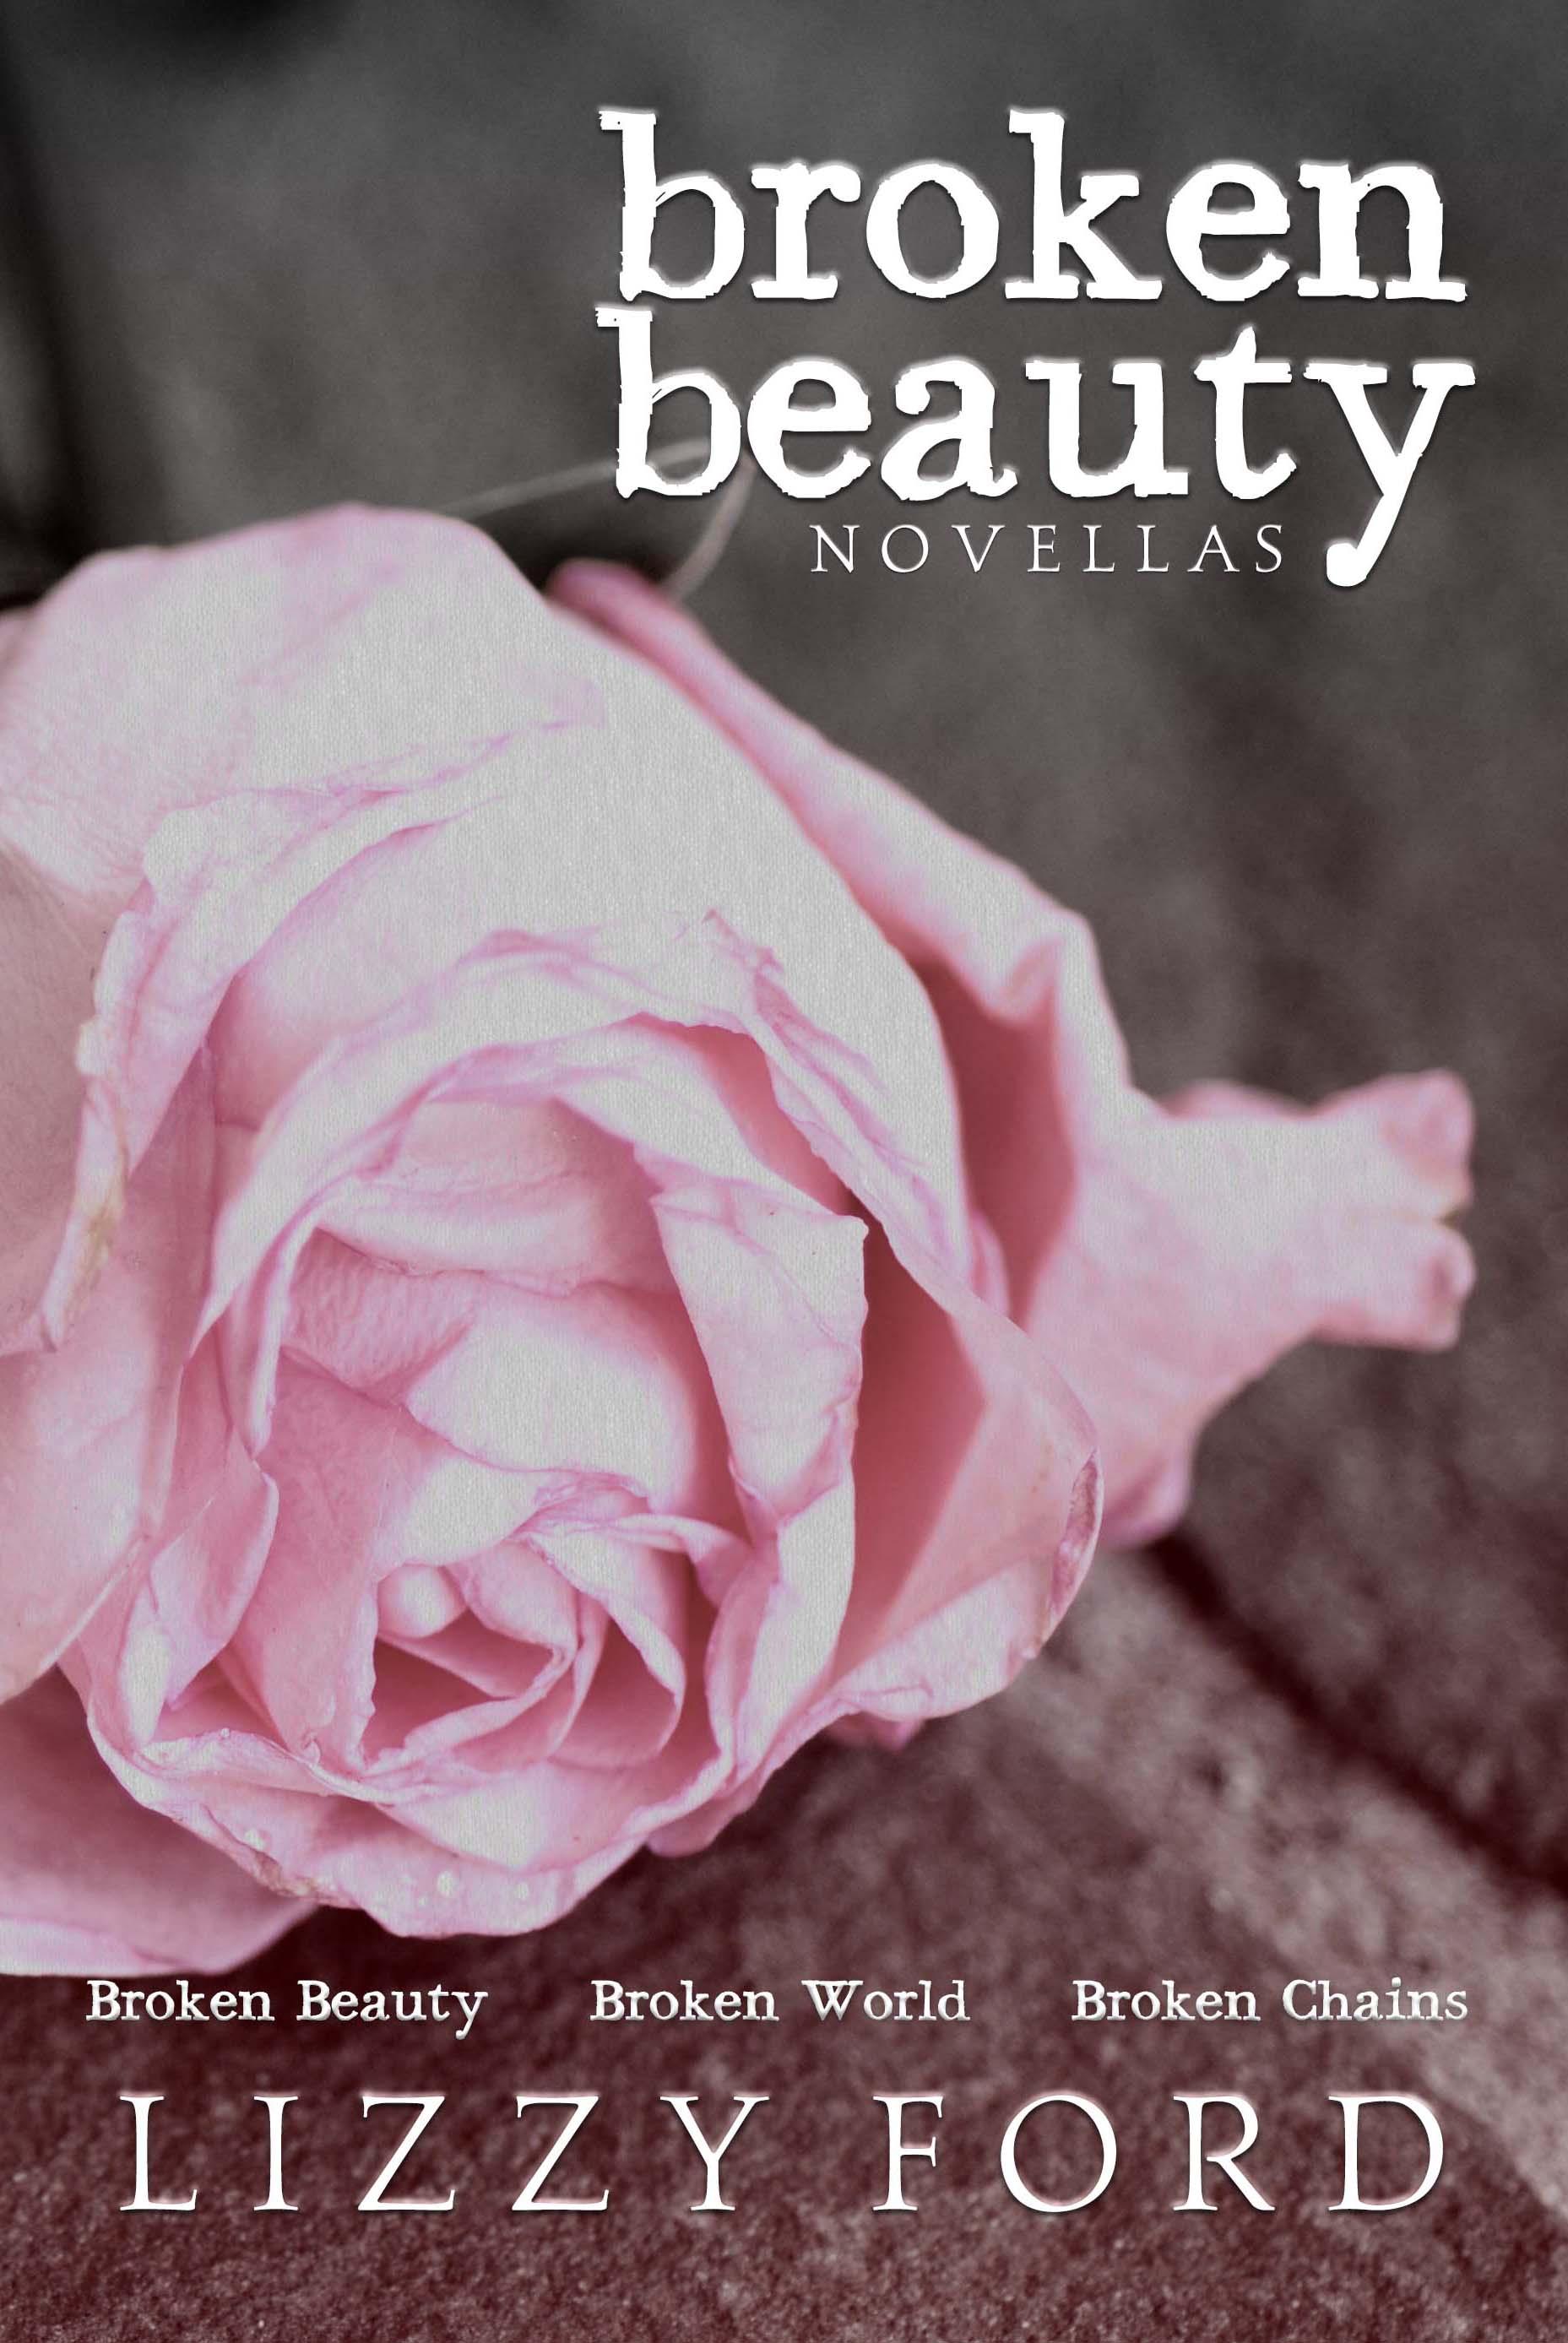 Broken Beauty Novellas Omnibus